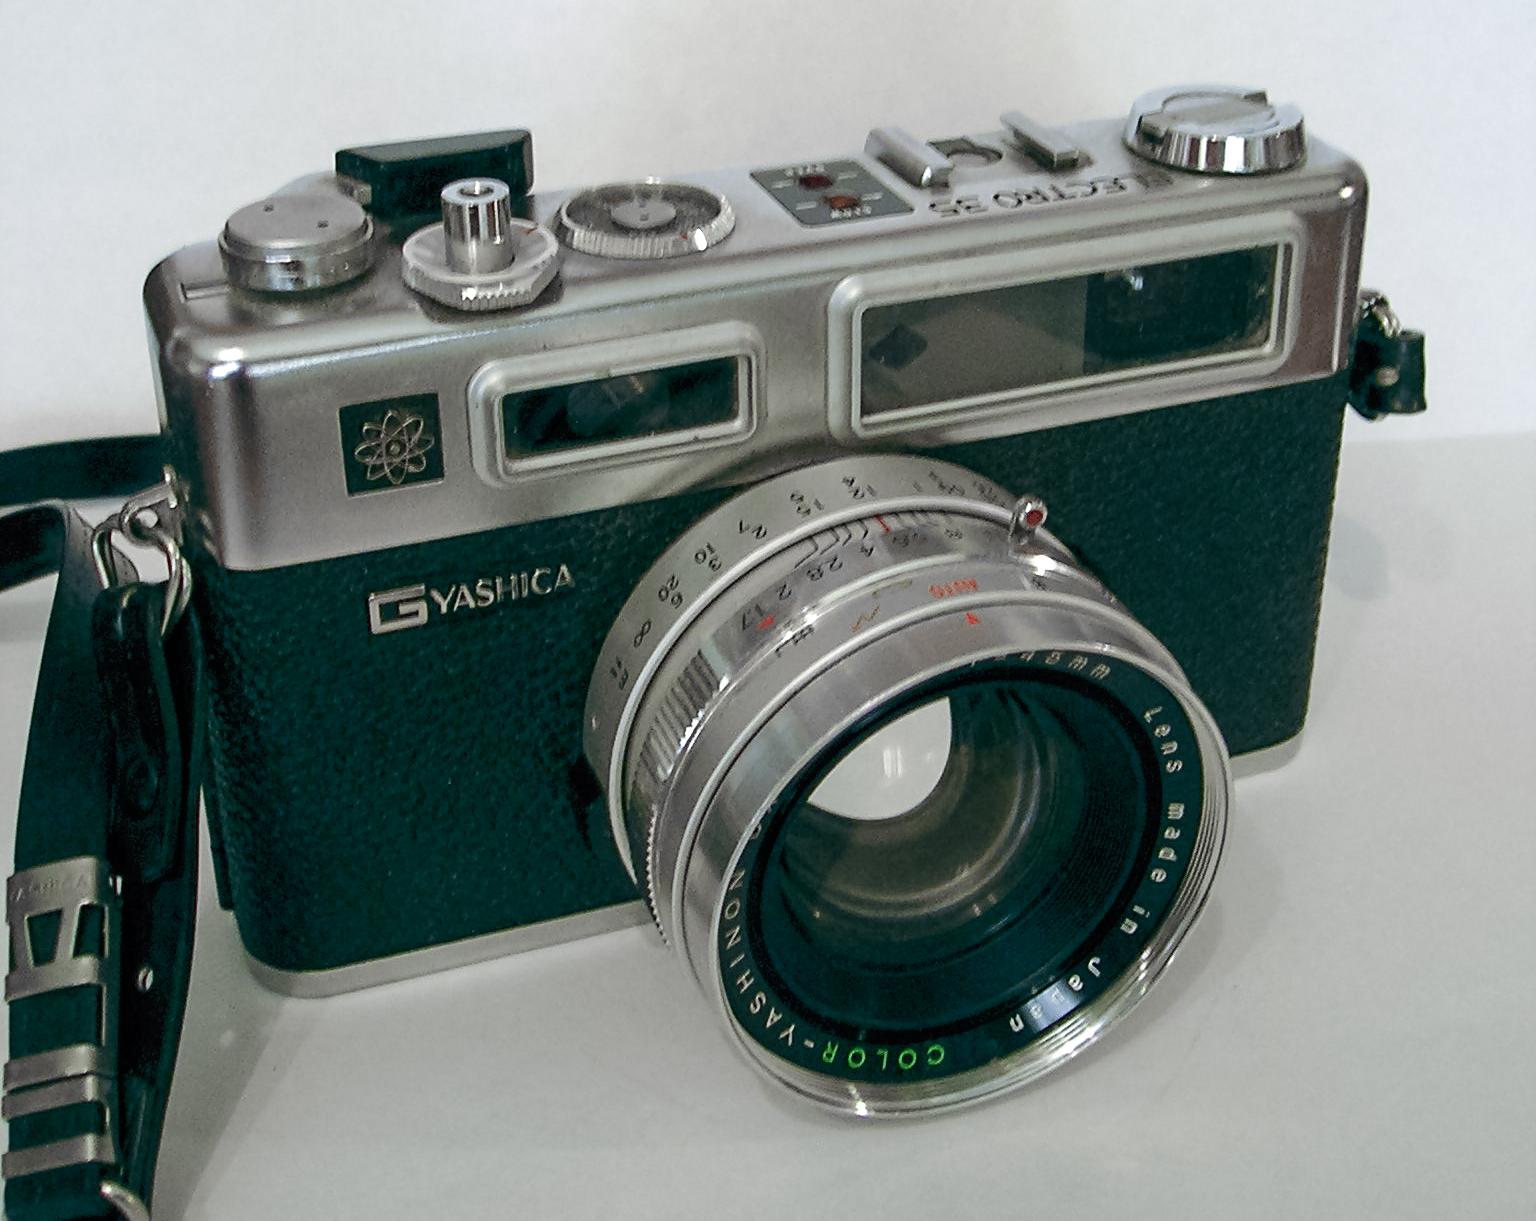 8Mm Vintage Camera yashica - wikipedia